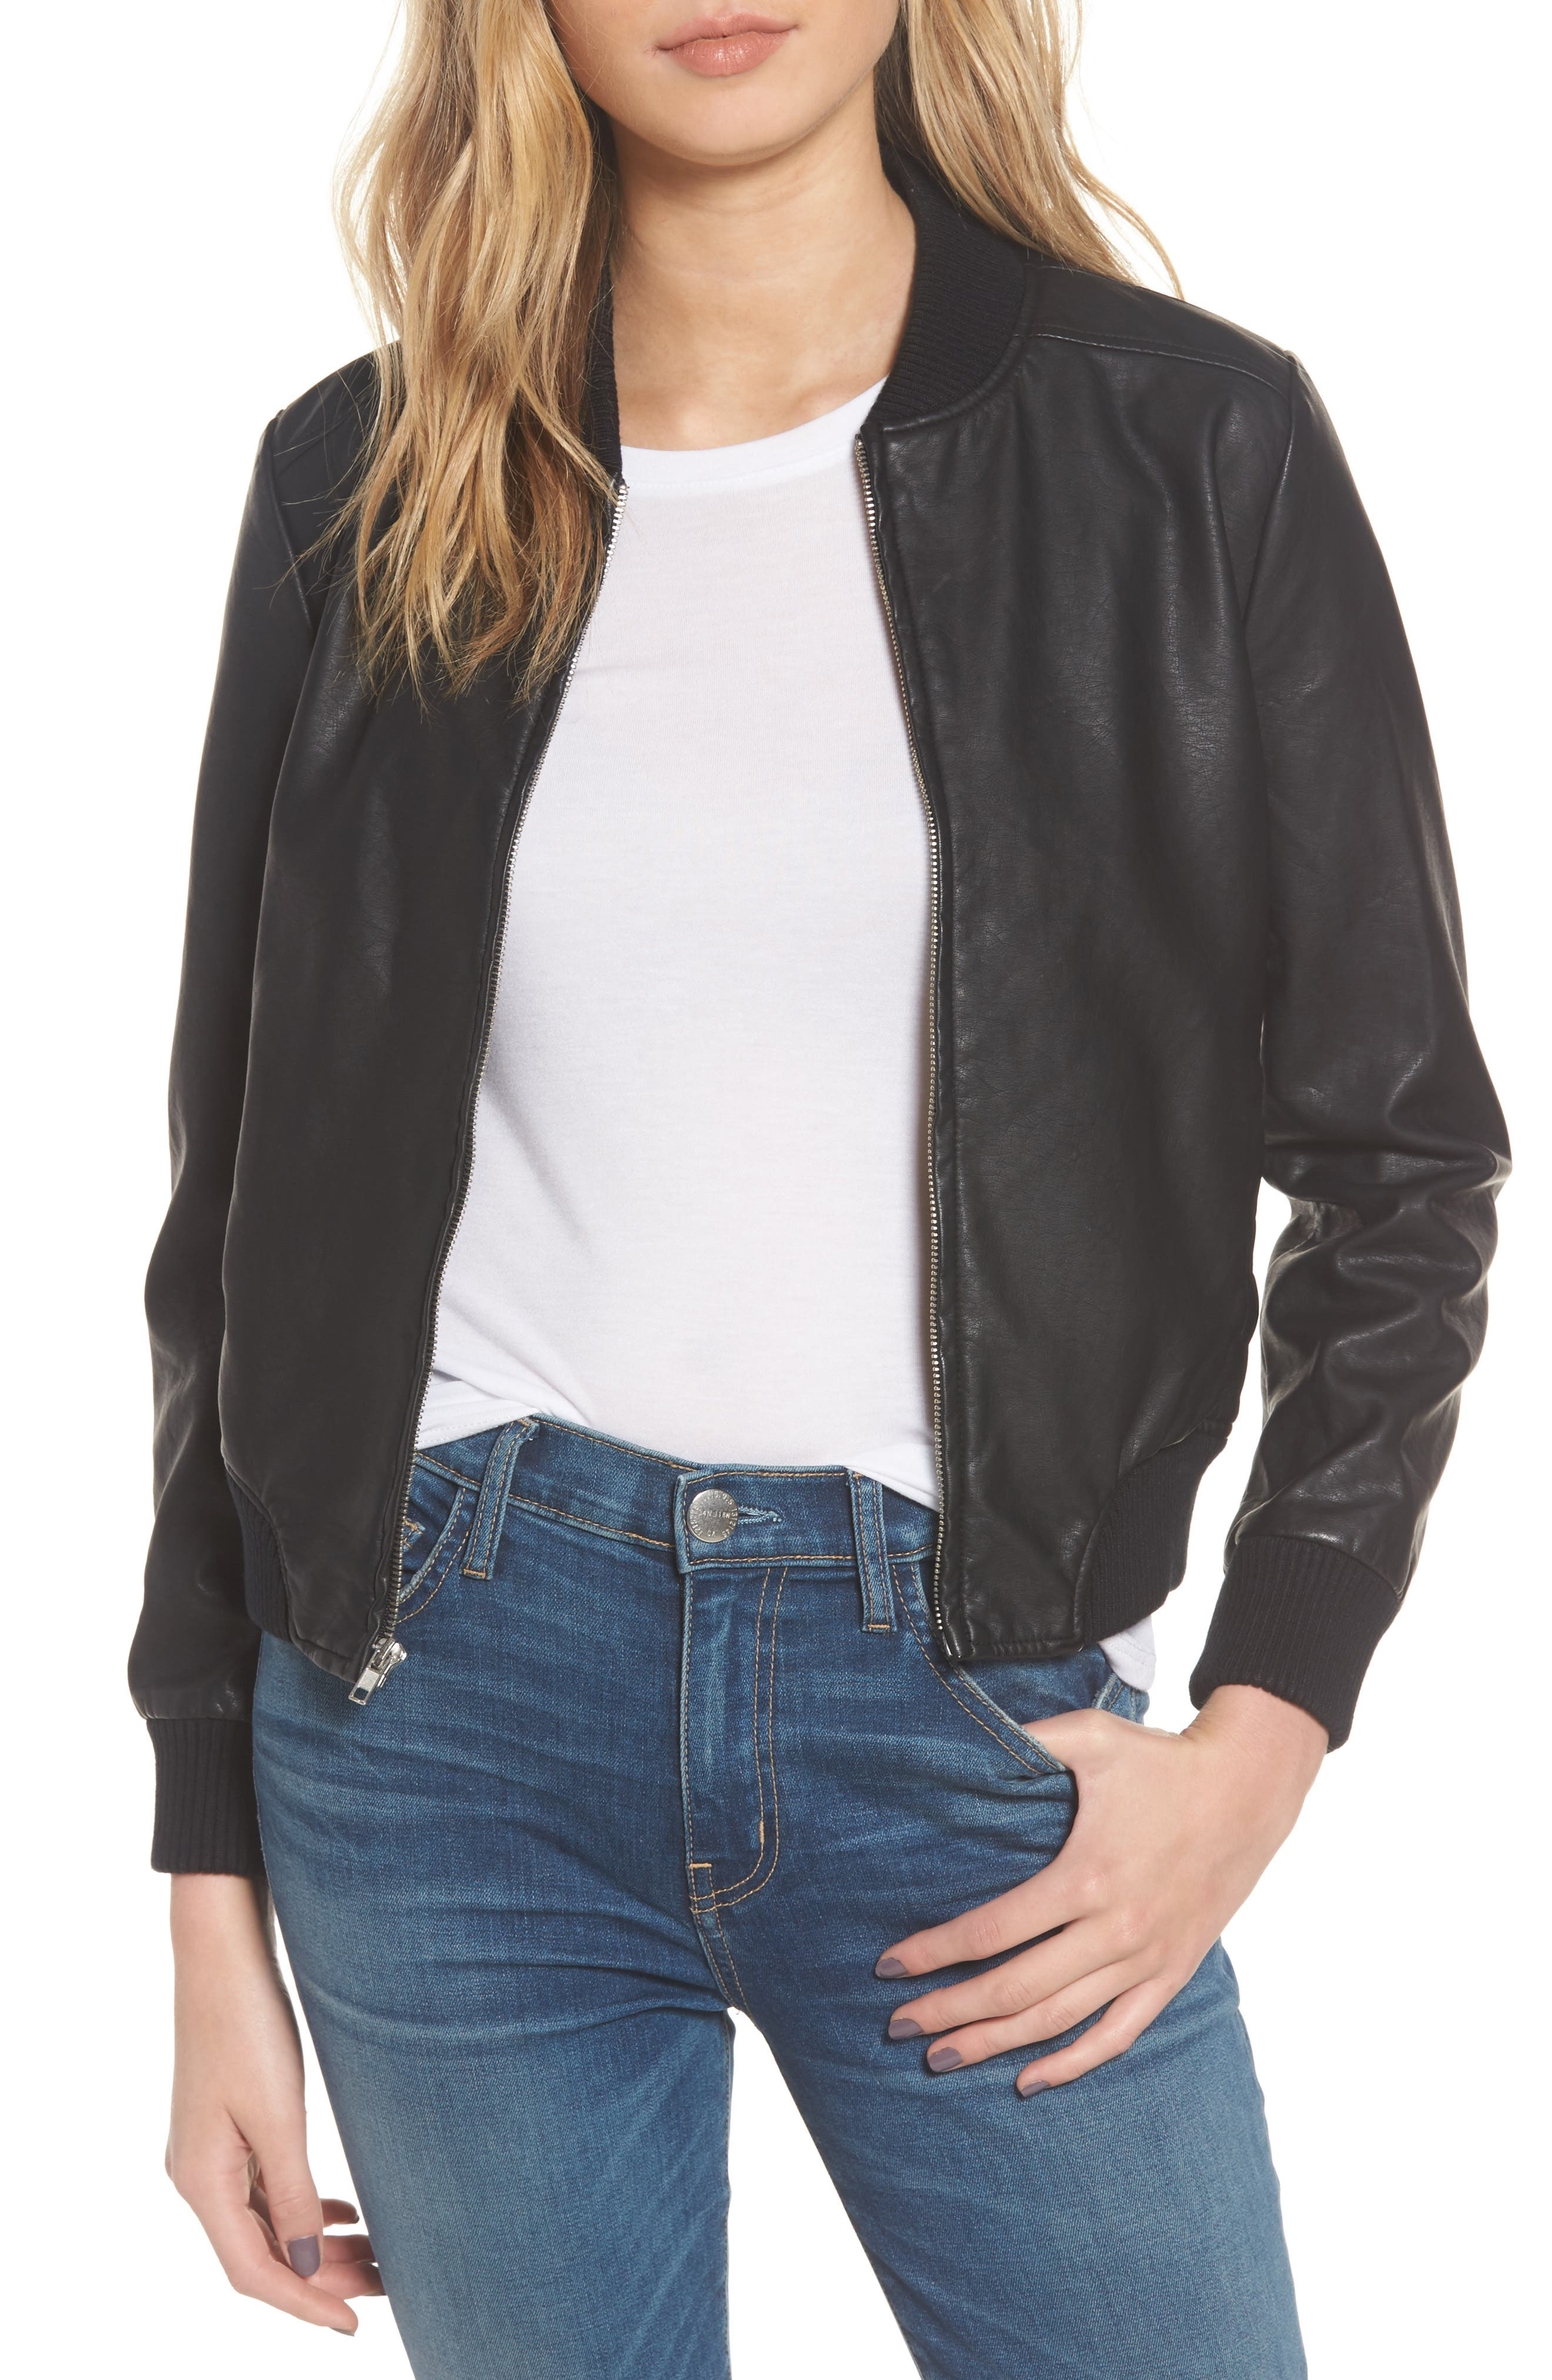 Alternate Image 1 Selected - BB Dakota Gavin Faux Leather Bomber Jacket